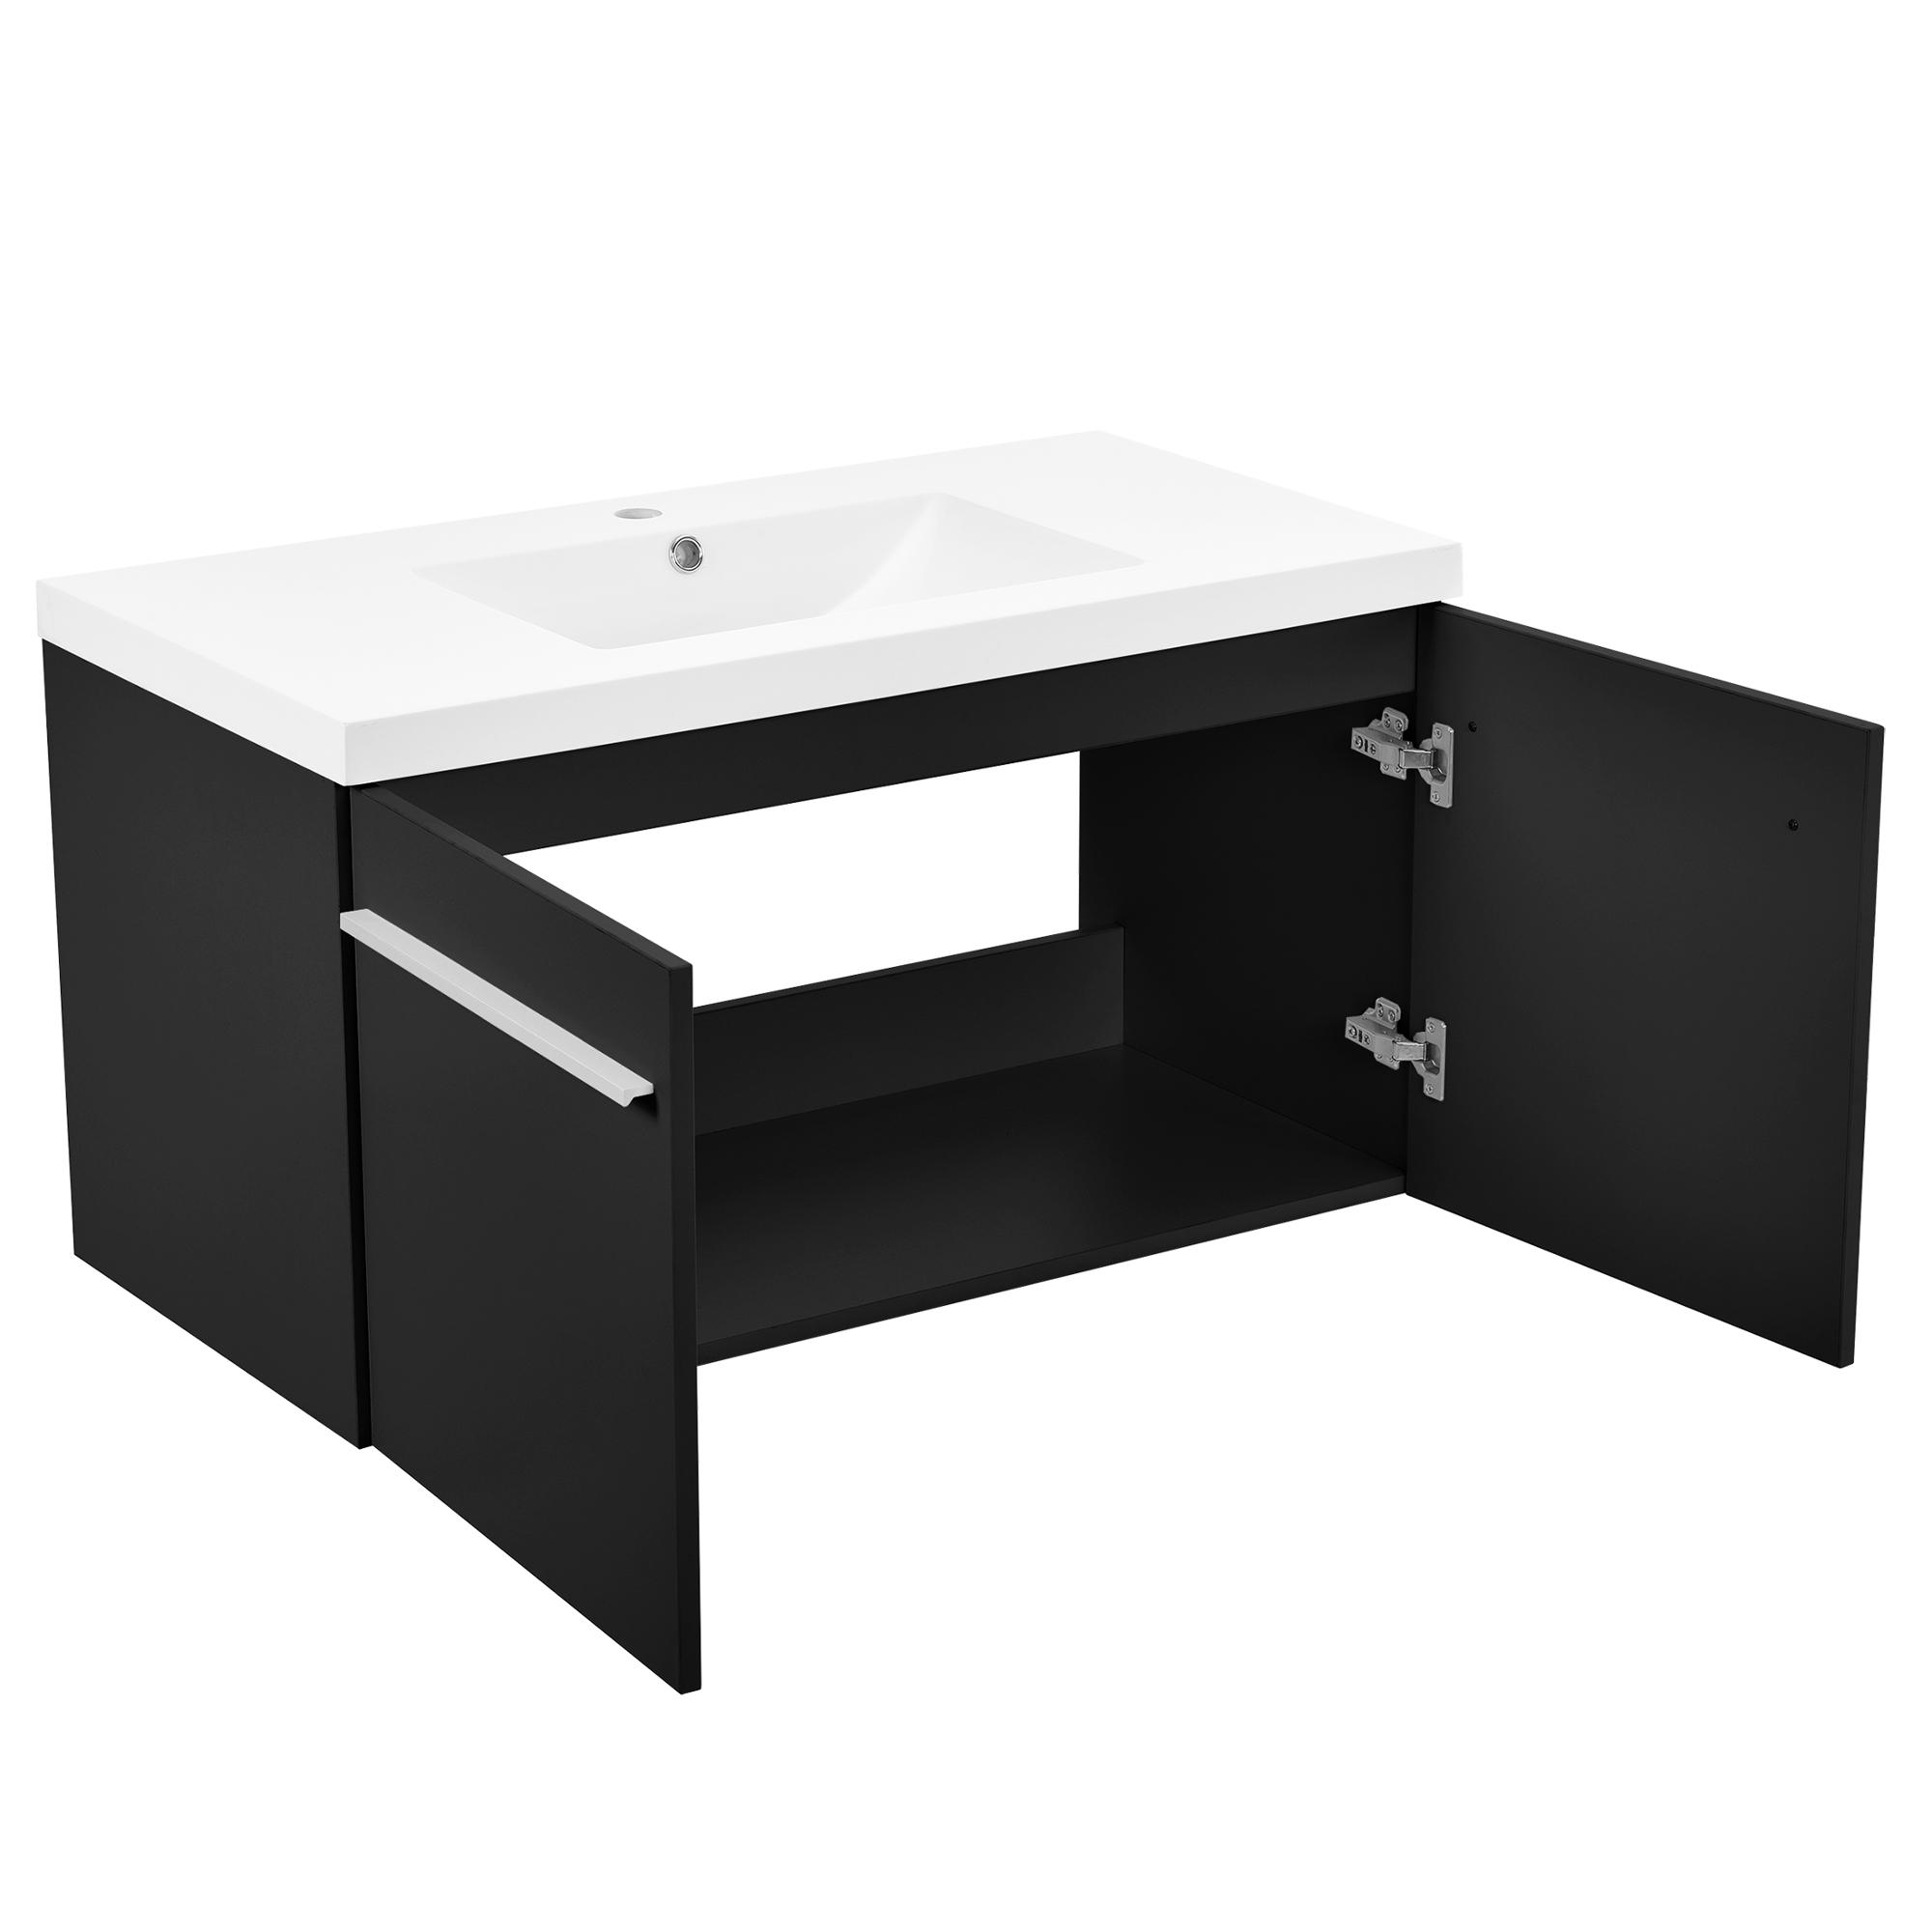 Neuhaus armoire de salle bain meuble dessous lavabo noir for Armoire salle de bain noir